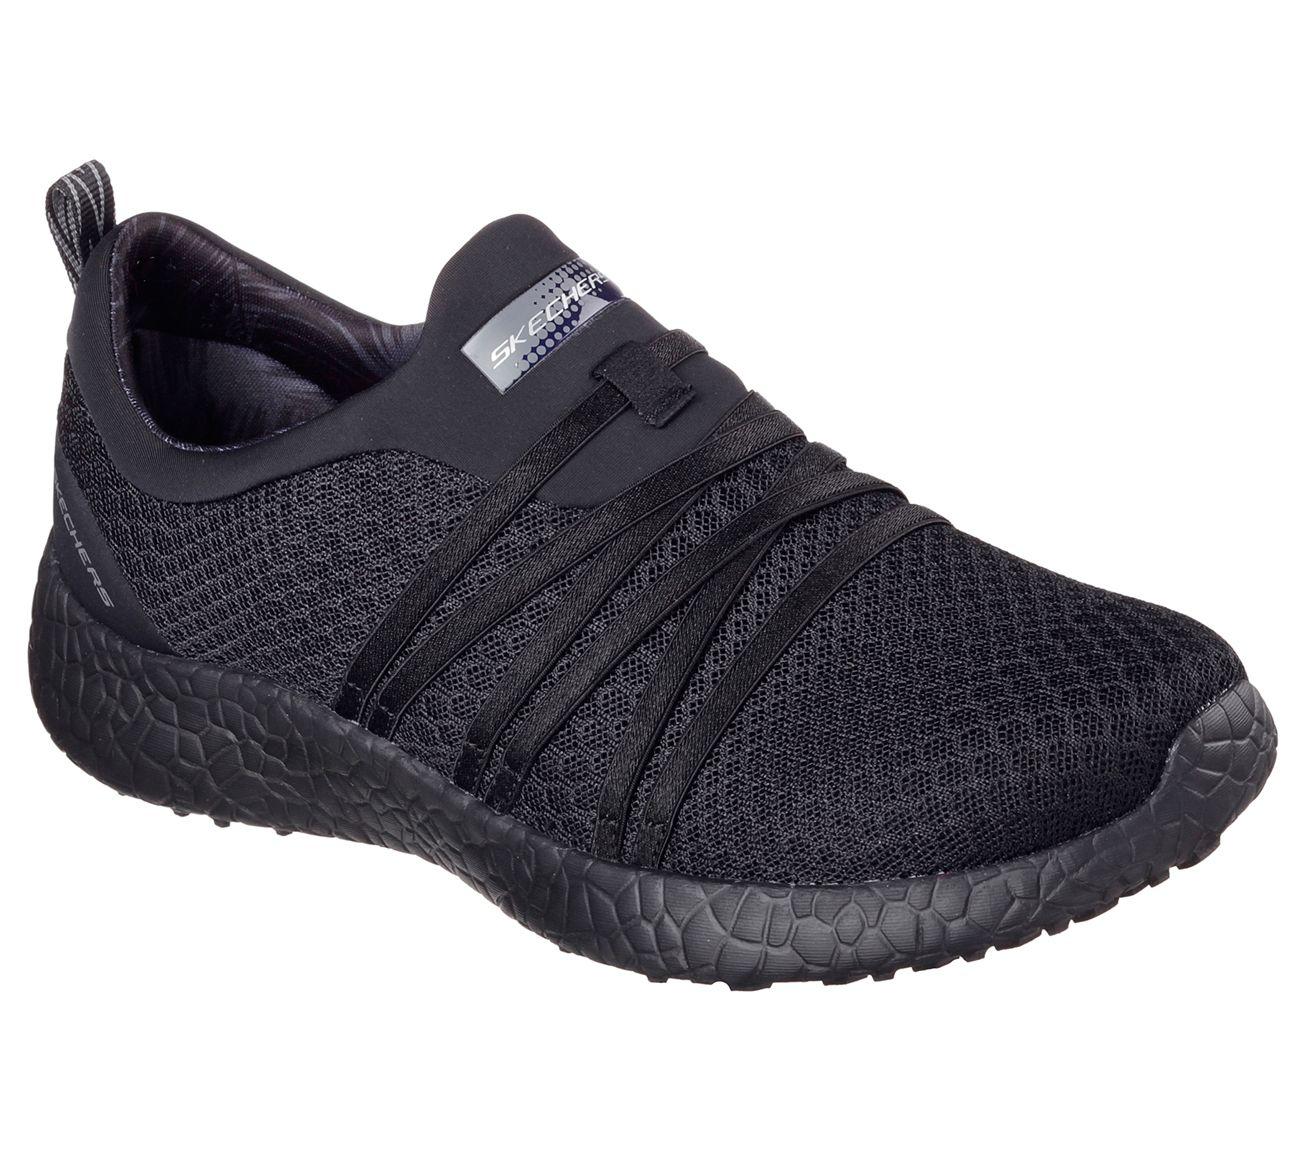 Bikers Pedestrian - Zapatillas de material sintético para mujer, color gris, talla 38 EU (5 Damen UK) Skechers